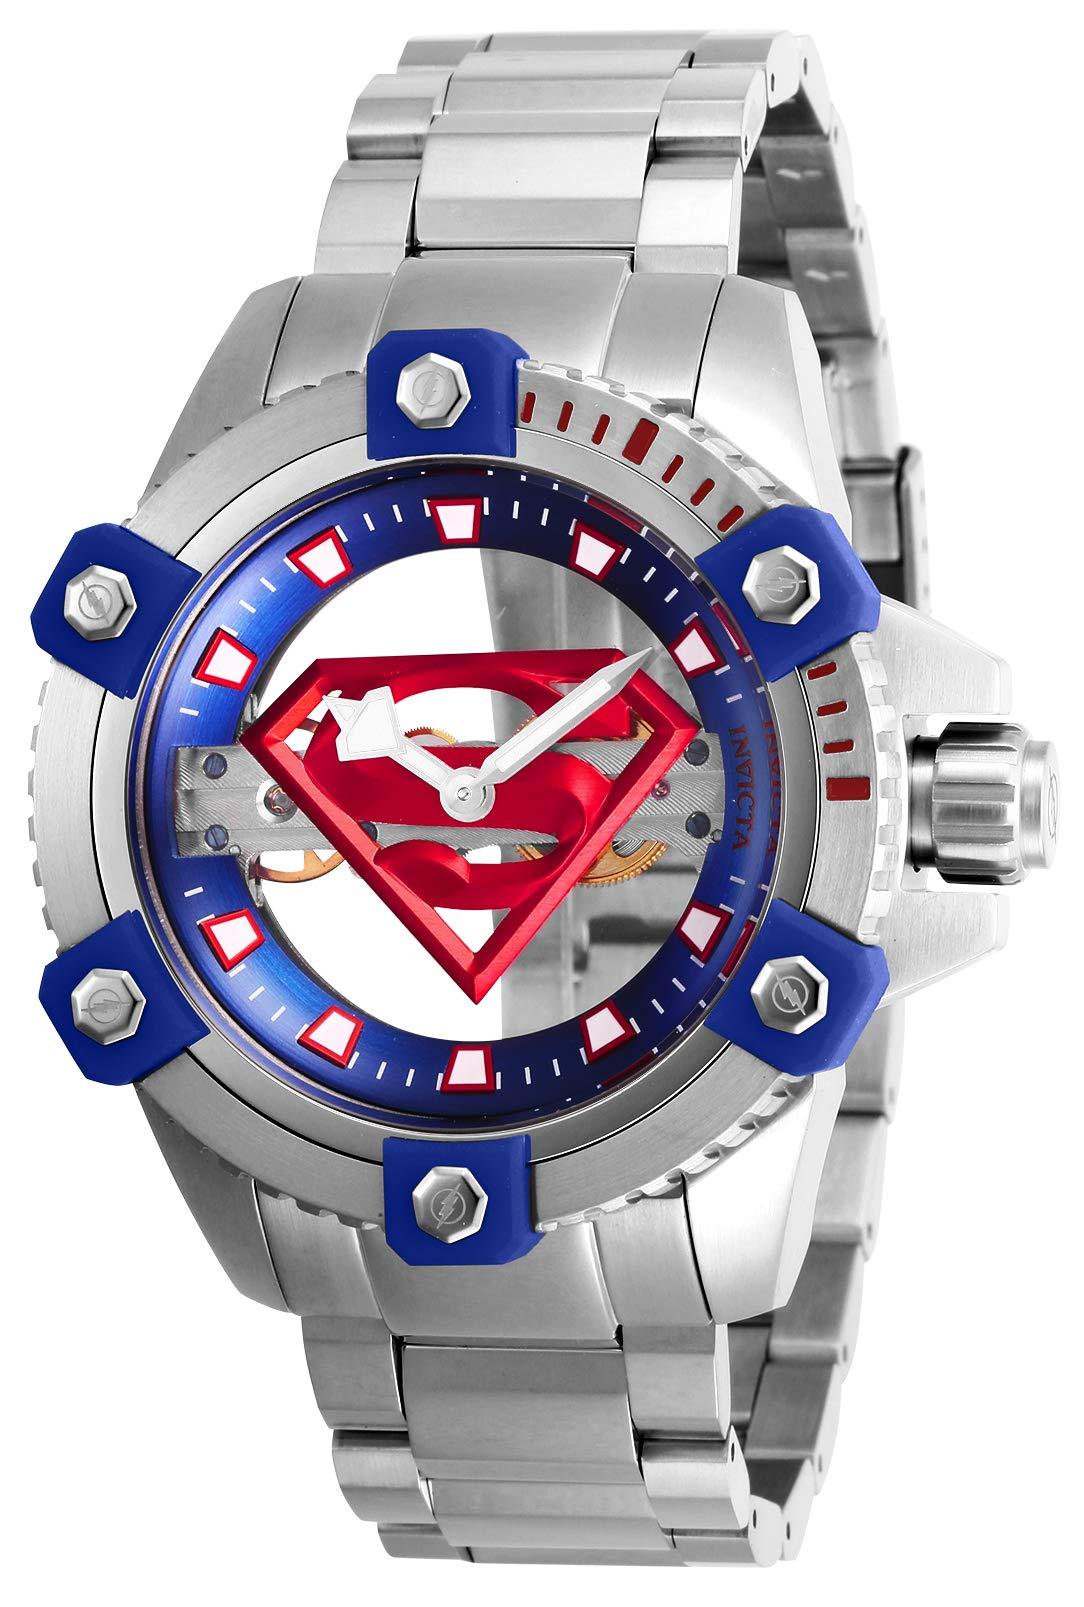 ویکالا · خرید  اصل اورجینال · خرید از آمازون · Invicta Men's DC Comics Mechanical Watch with Stainless Steel Strap, Silver, 24 (Model: 26842) wekala · ویکالا